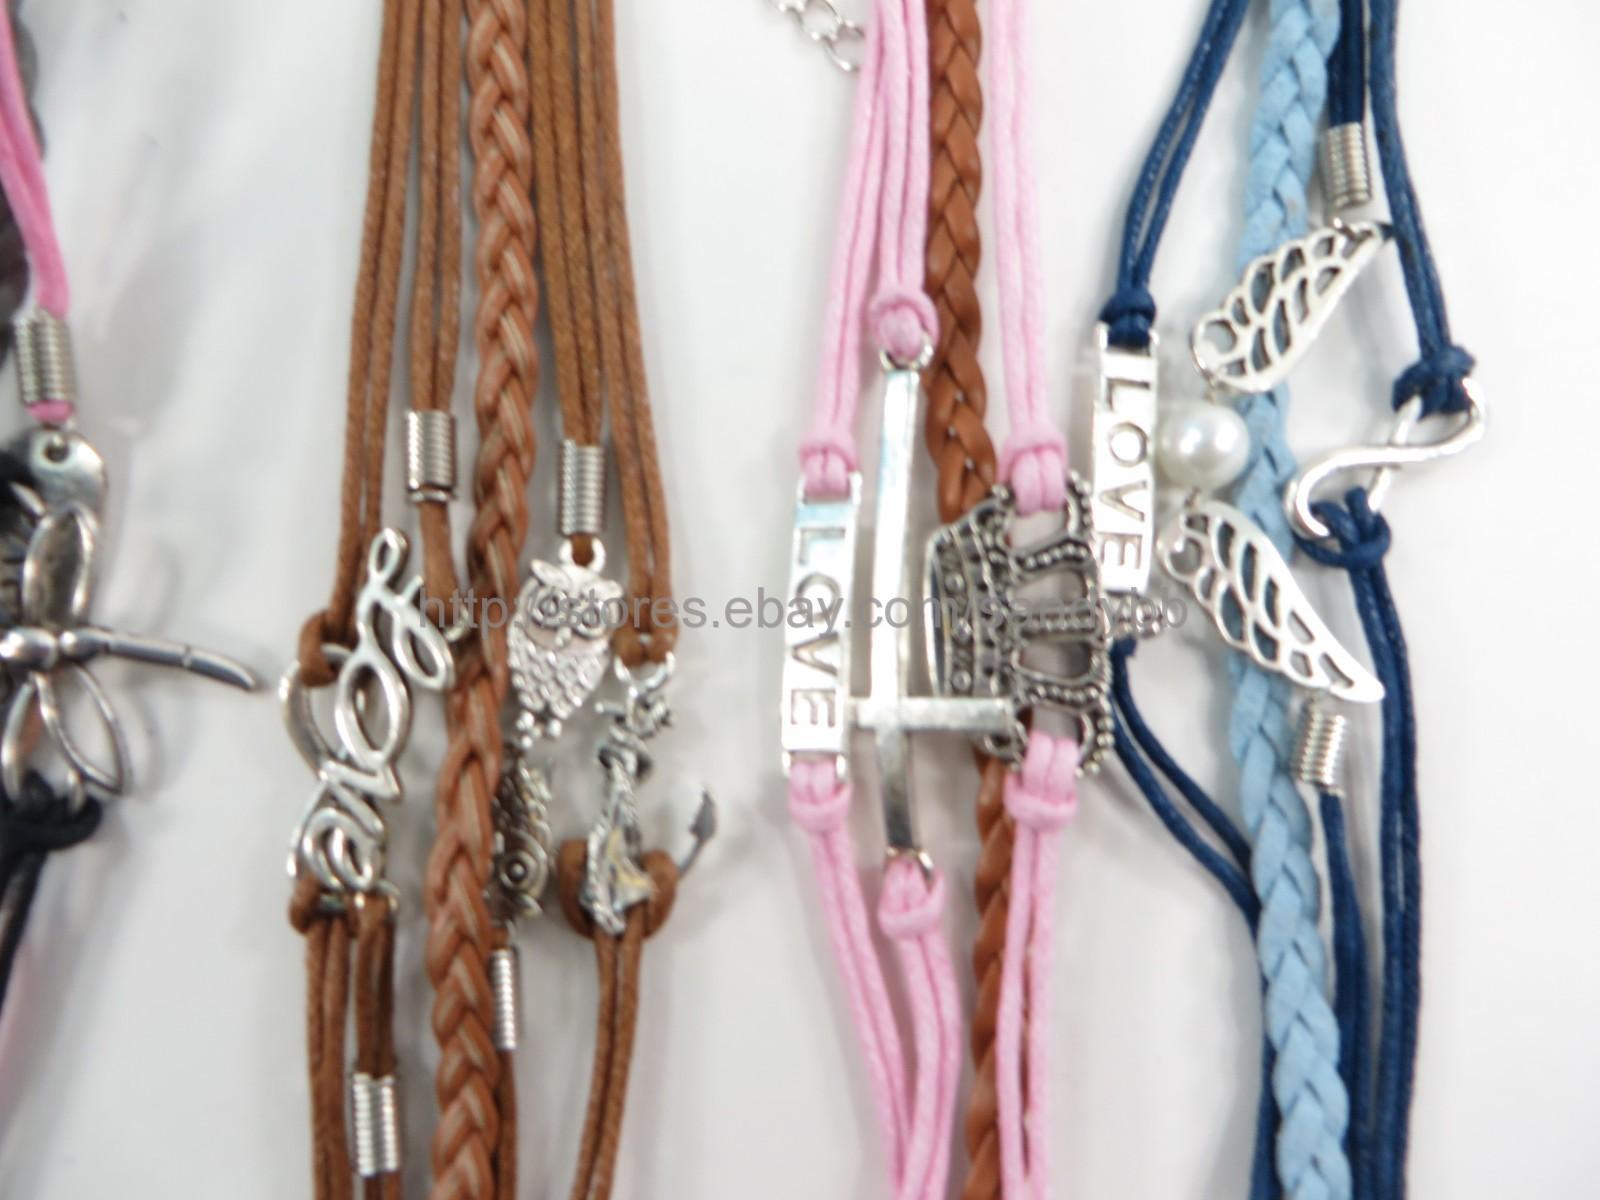 $0.75 each 100 pcs infinity charm bracelet wholesale jewelry lot